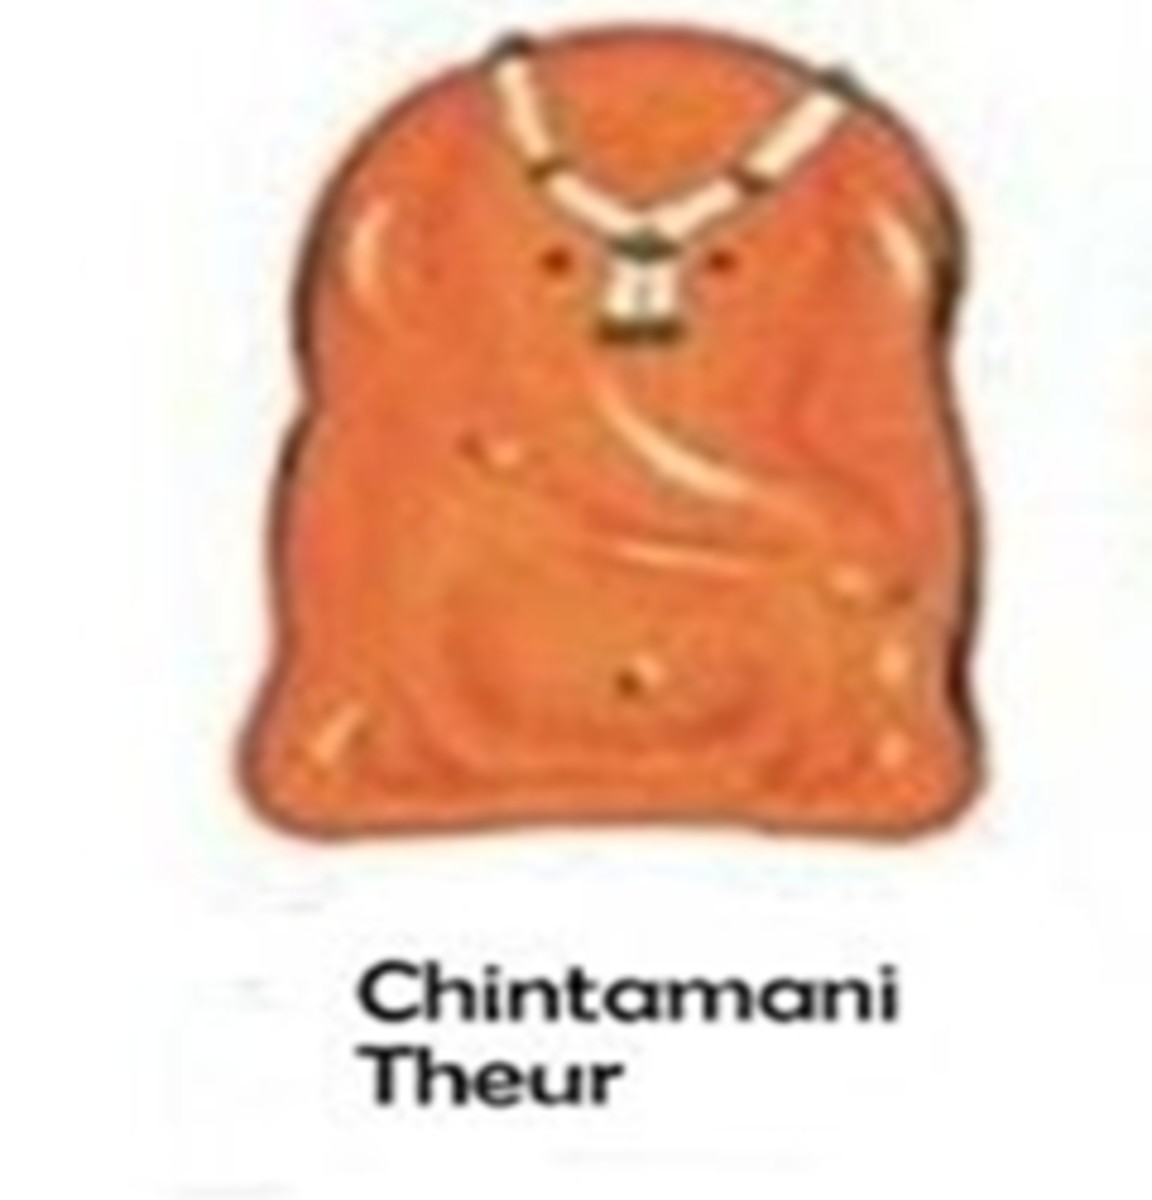 Shri cubrir el nthamani templo en llamas, theur